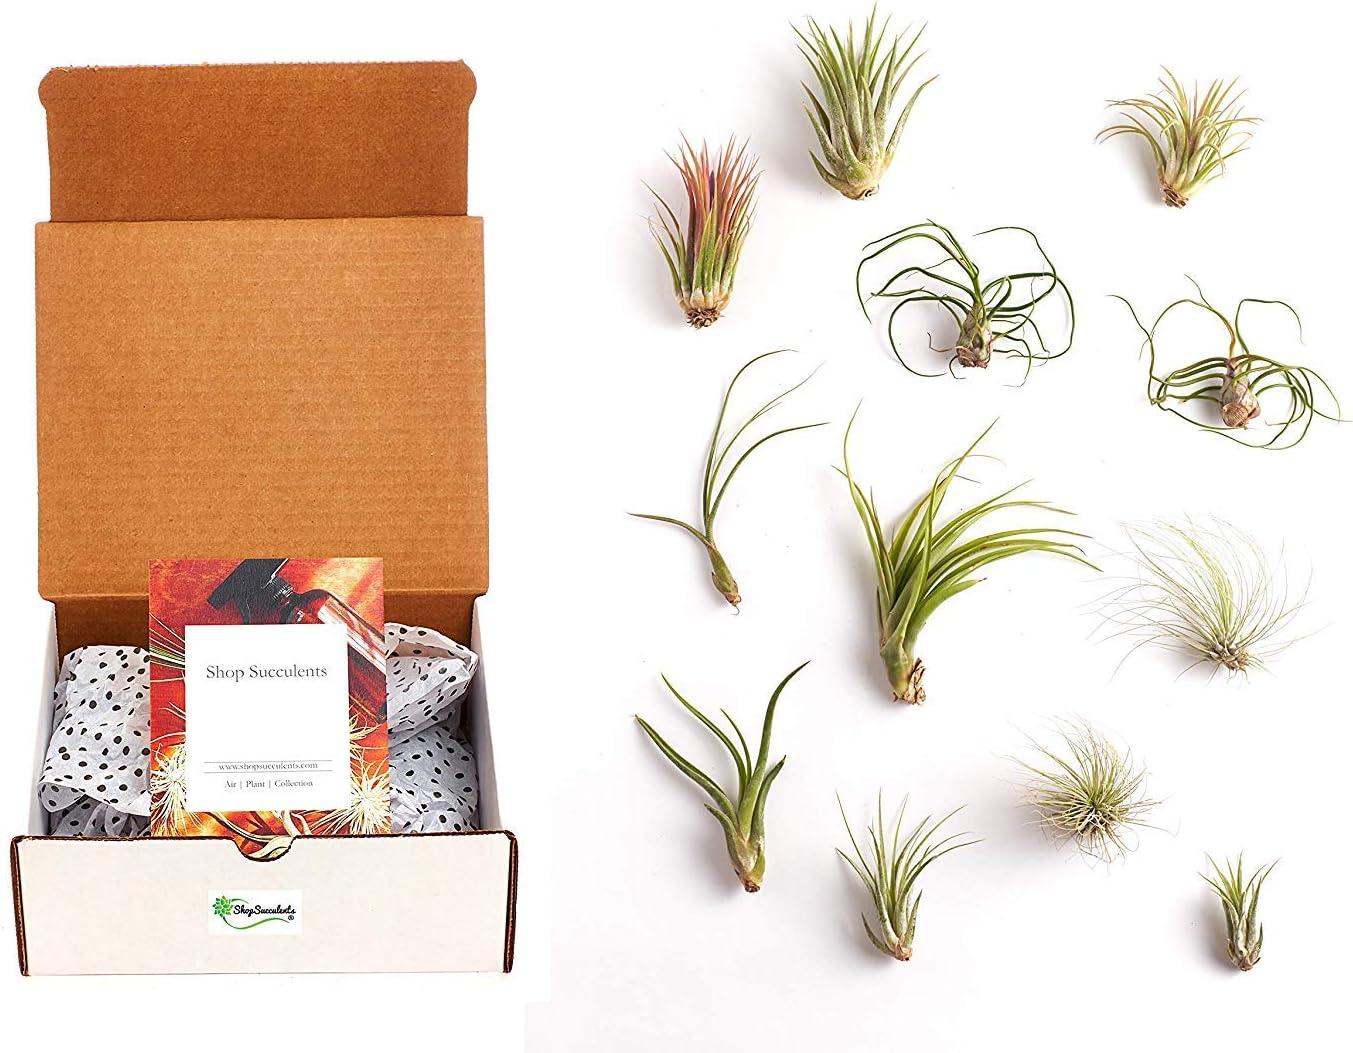 Shop Succulents Amber Spray Bottle Live Air Plant Variety Pack | Tillandsia Terrarium Kit, 12, Green